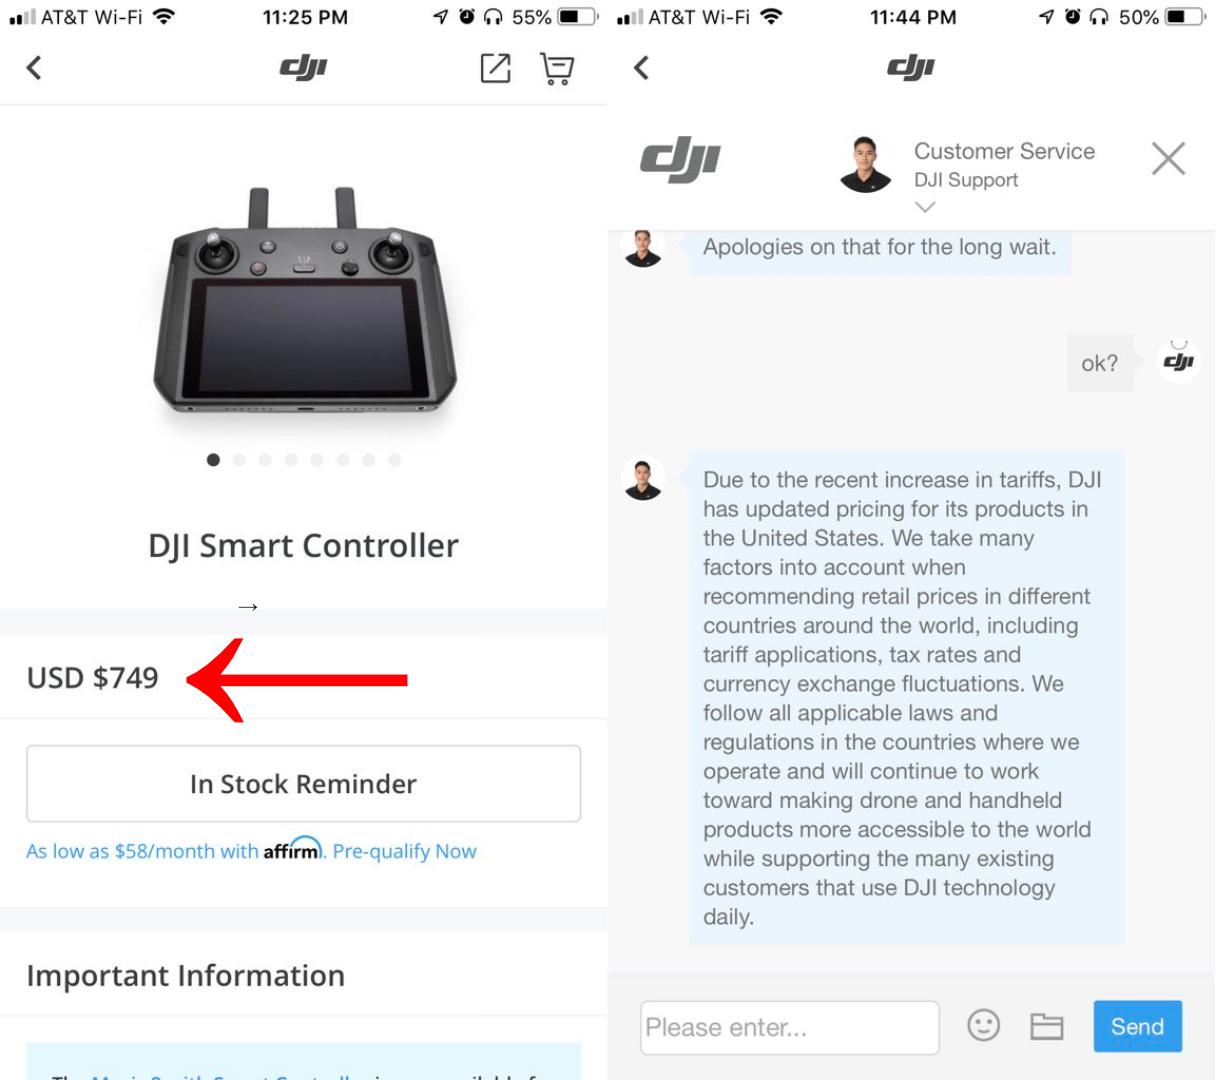 DJI raises price of Smart Controller to $749